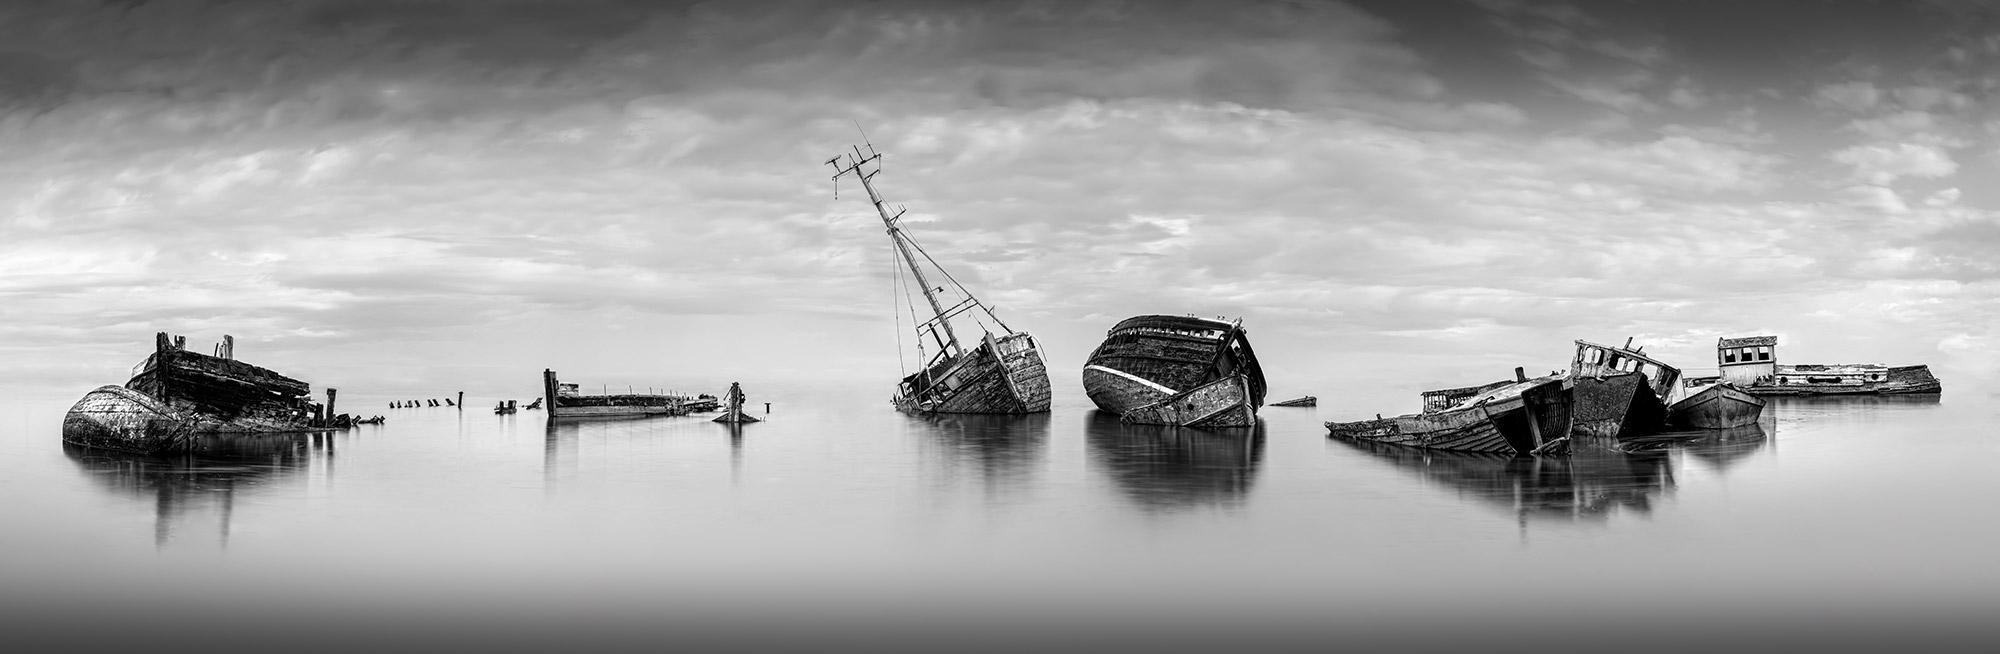 Pin Mill Boat Wrecks